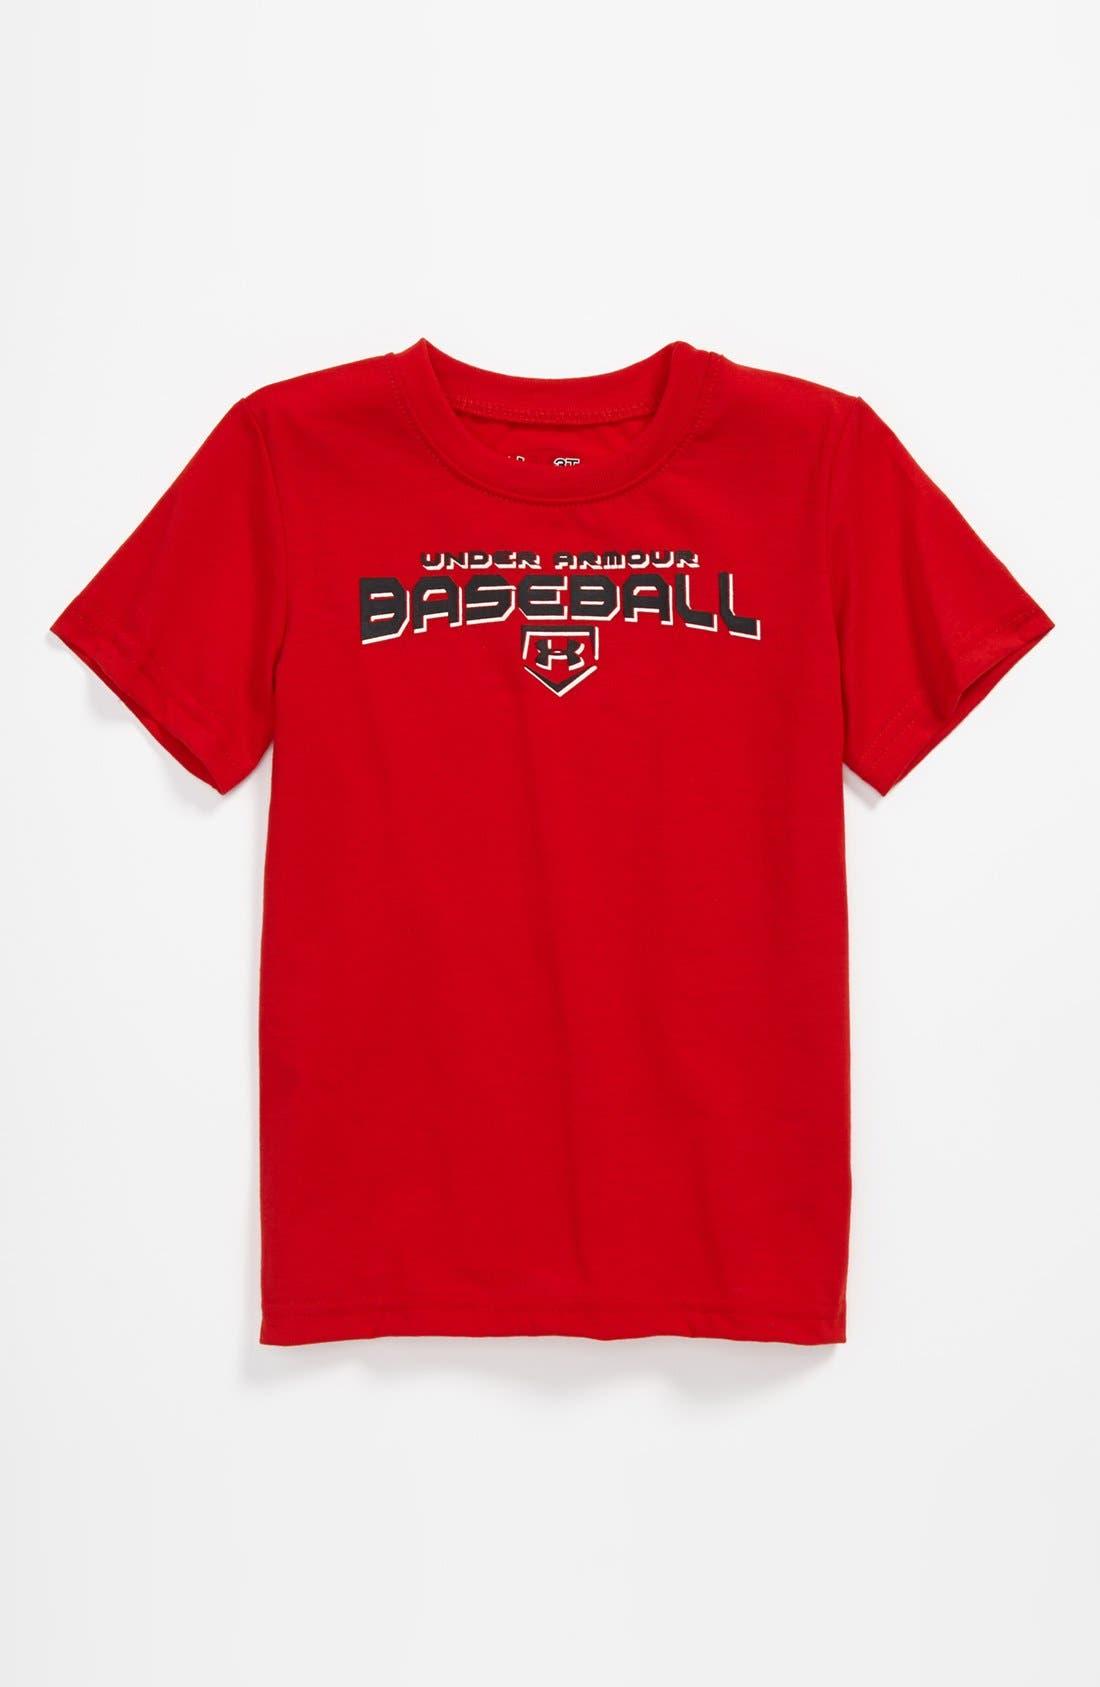 Main Image - Under Armour 'Baseball' T-Shirt (Toddler)